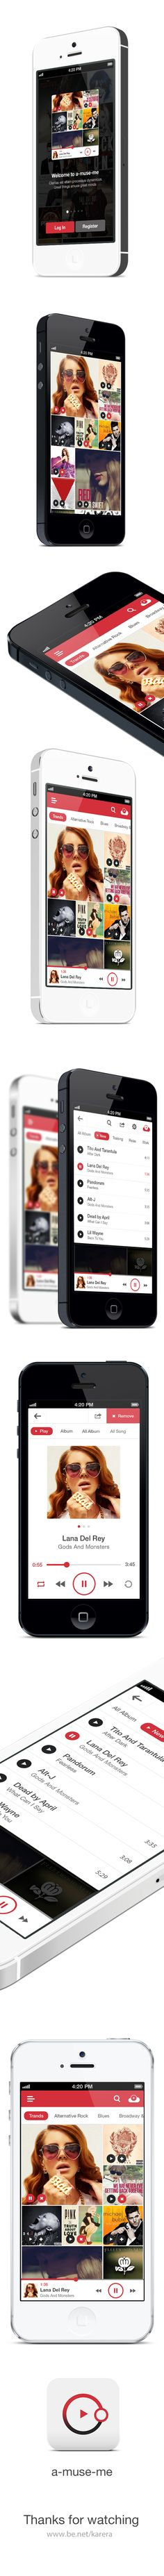 A-MUSE-ME. Music application by Alex Ds Karera, via Behance